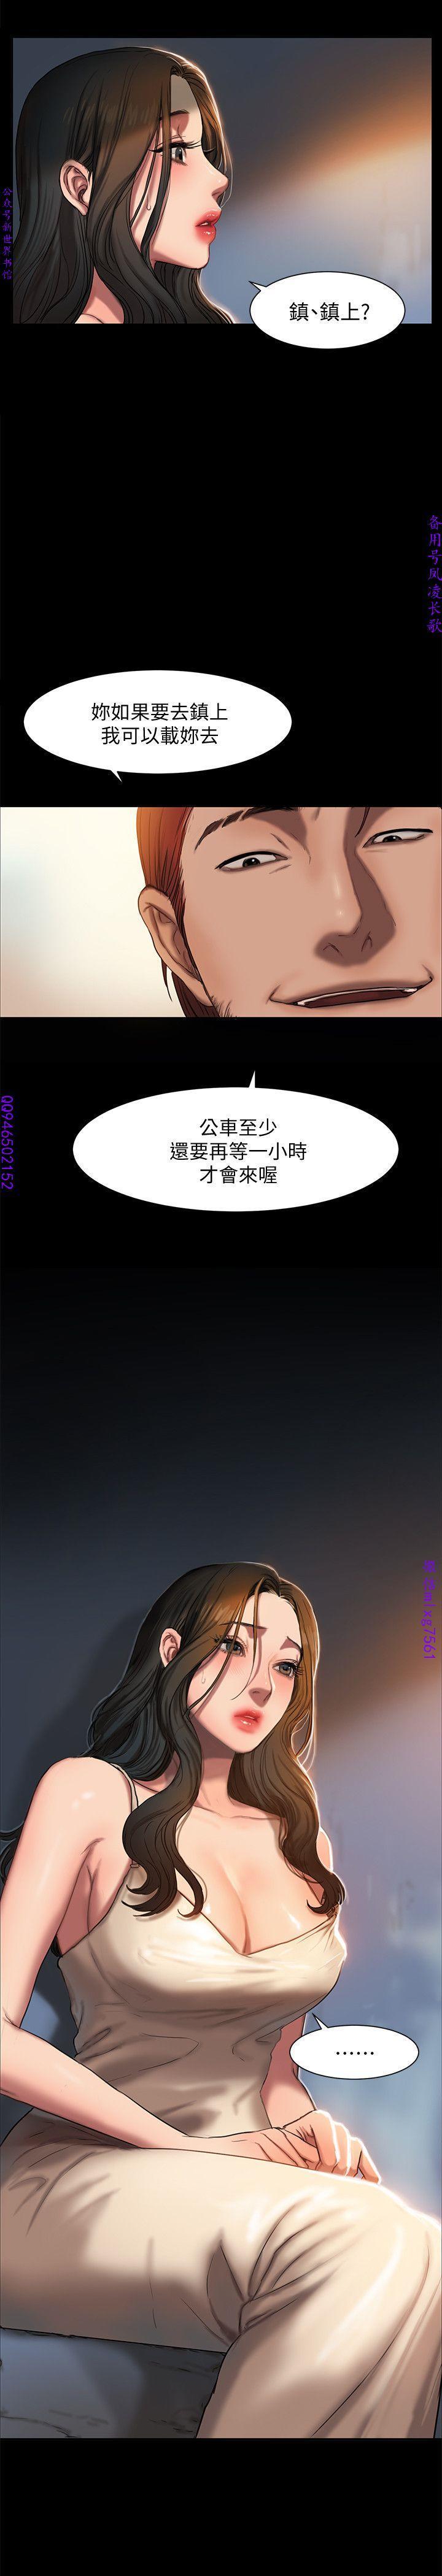 Run away 1-10【中文】 9